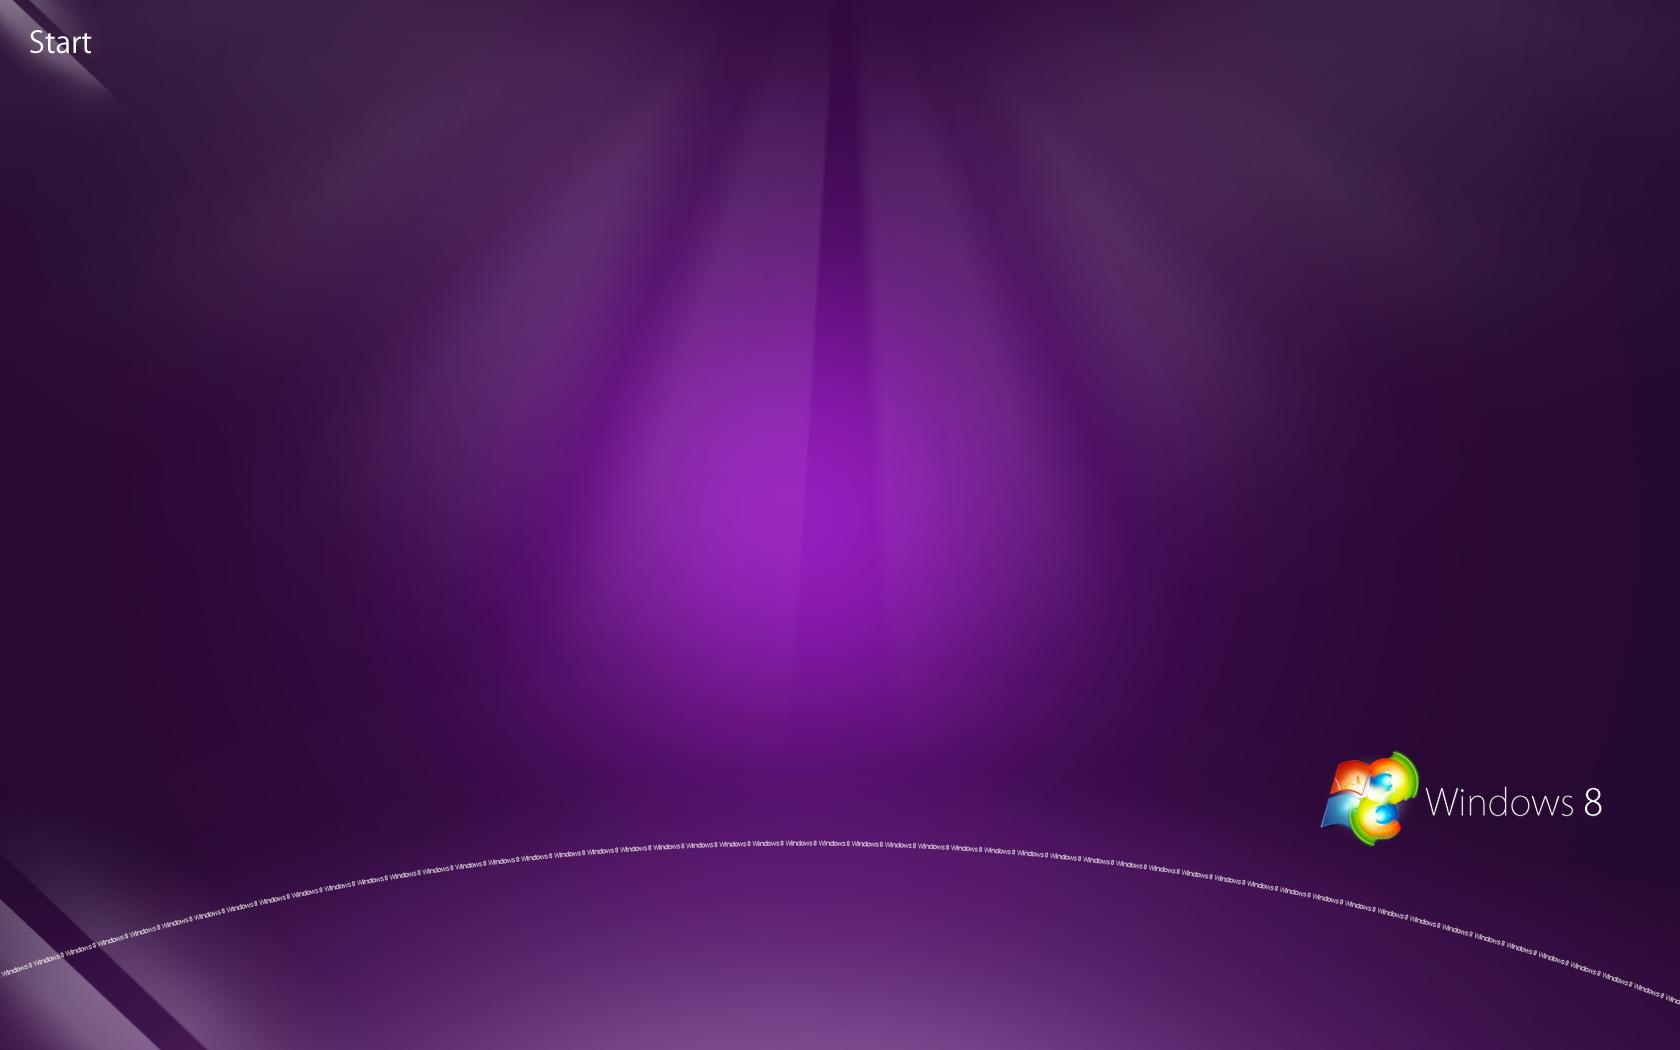 Windows 8 Official Wallpaper Purple 30 Beautiful Windows 8...